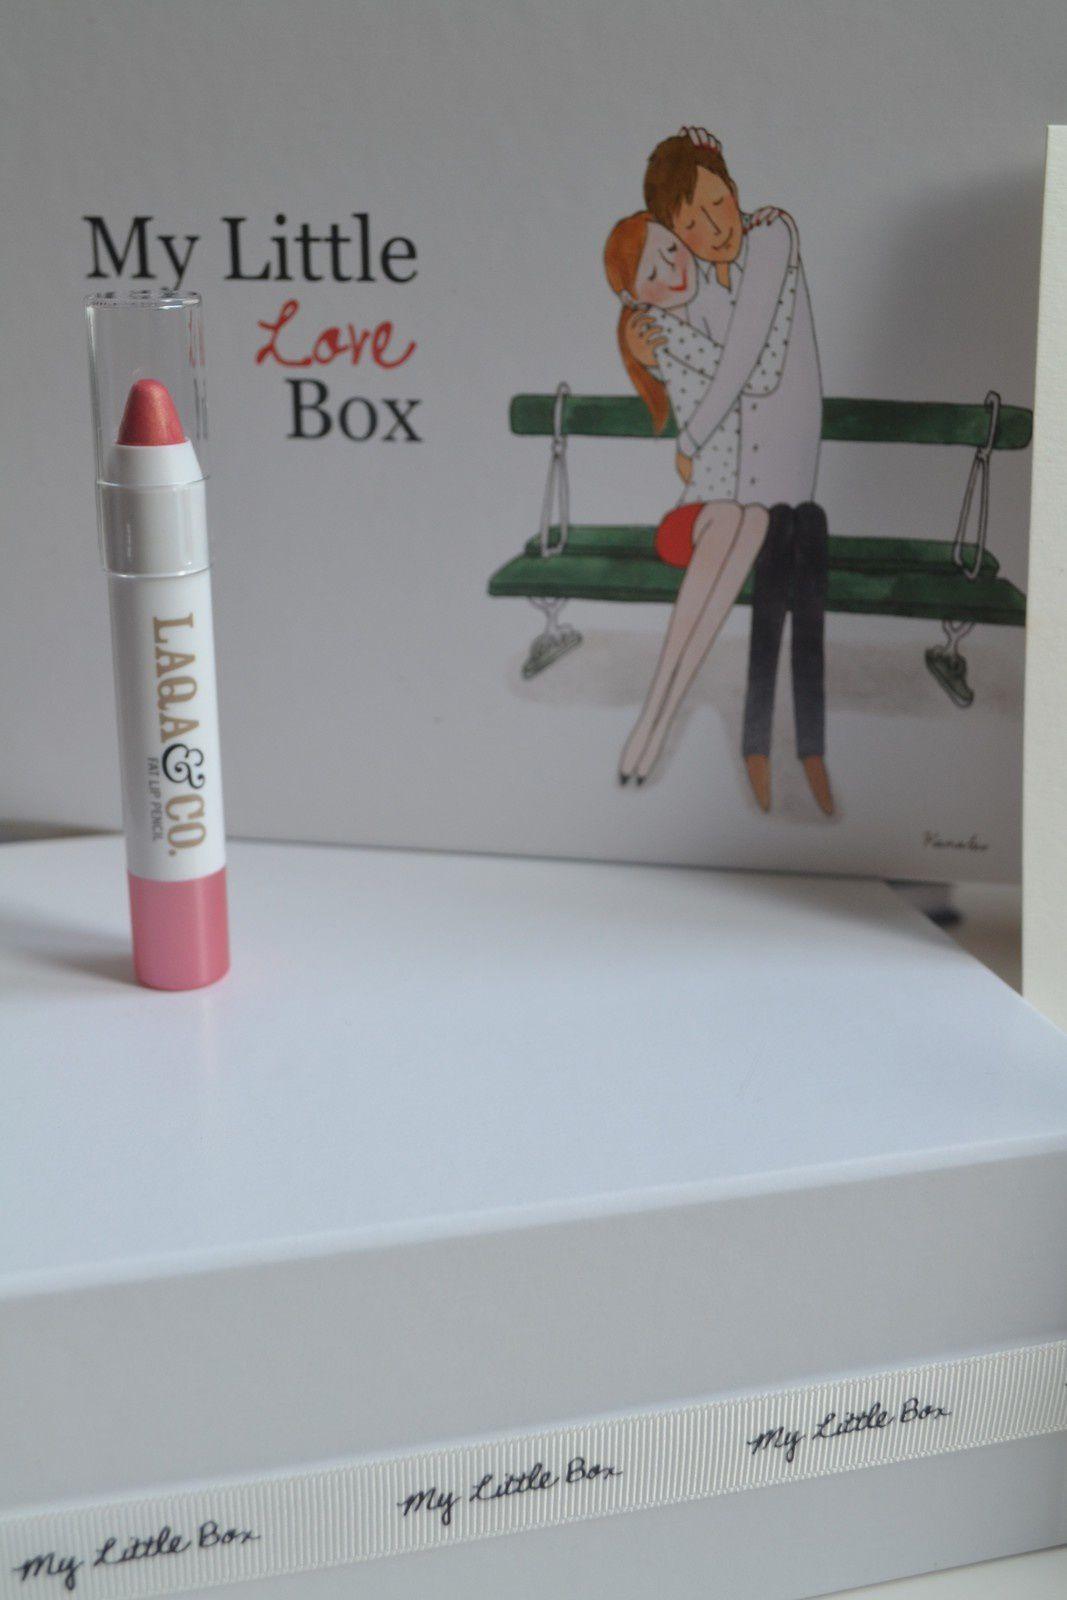 My Little Love Box